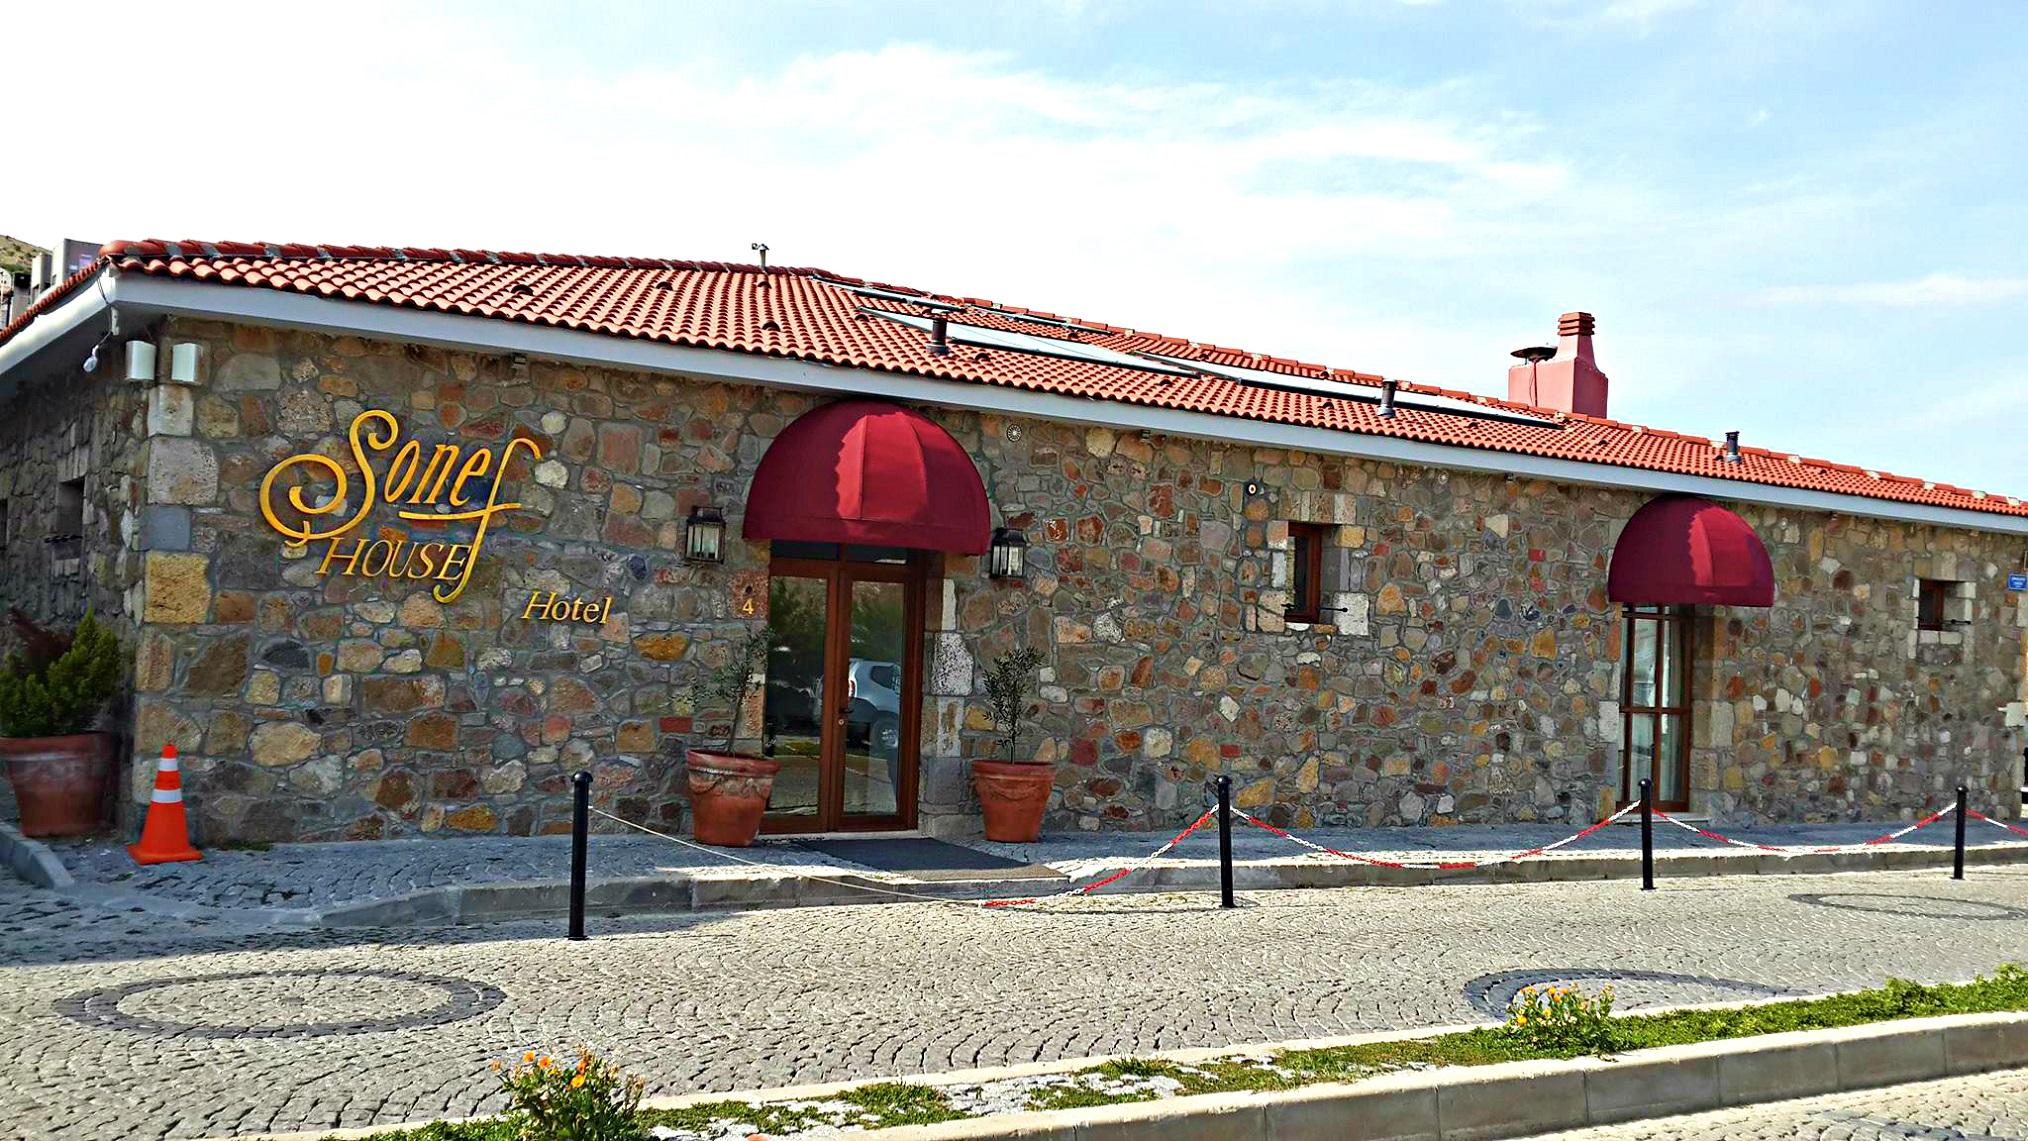 onef-house-otel